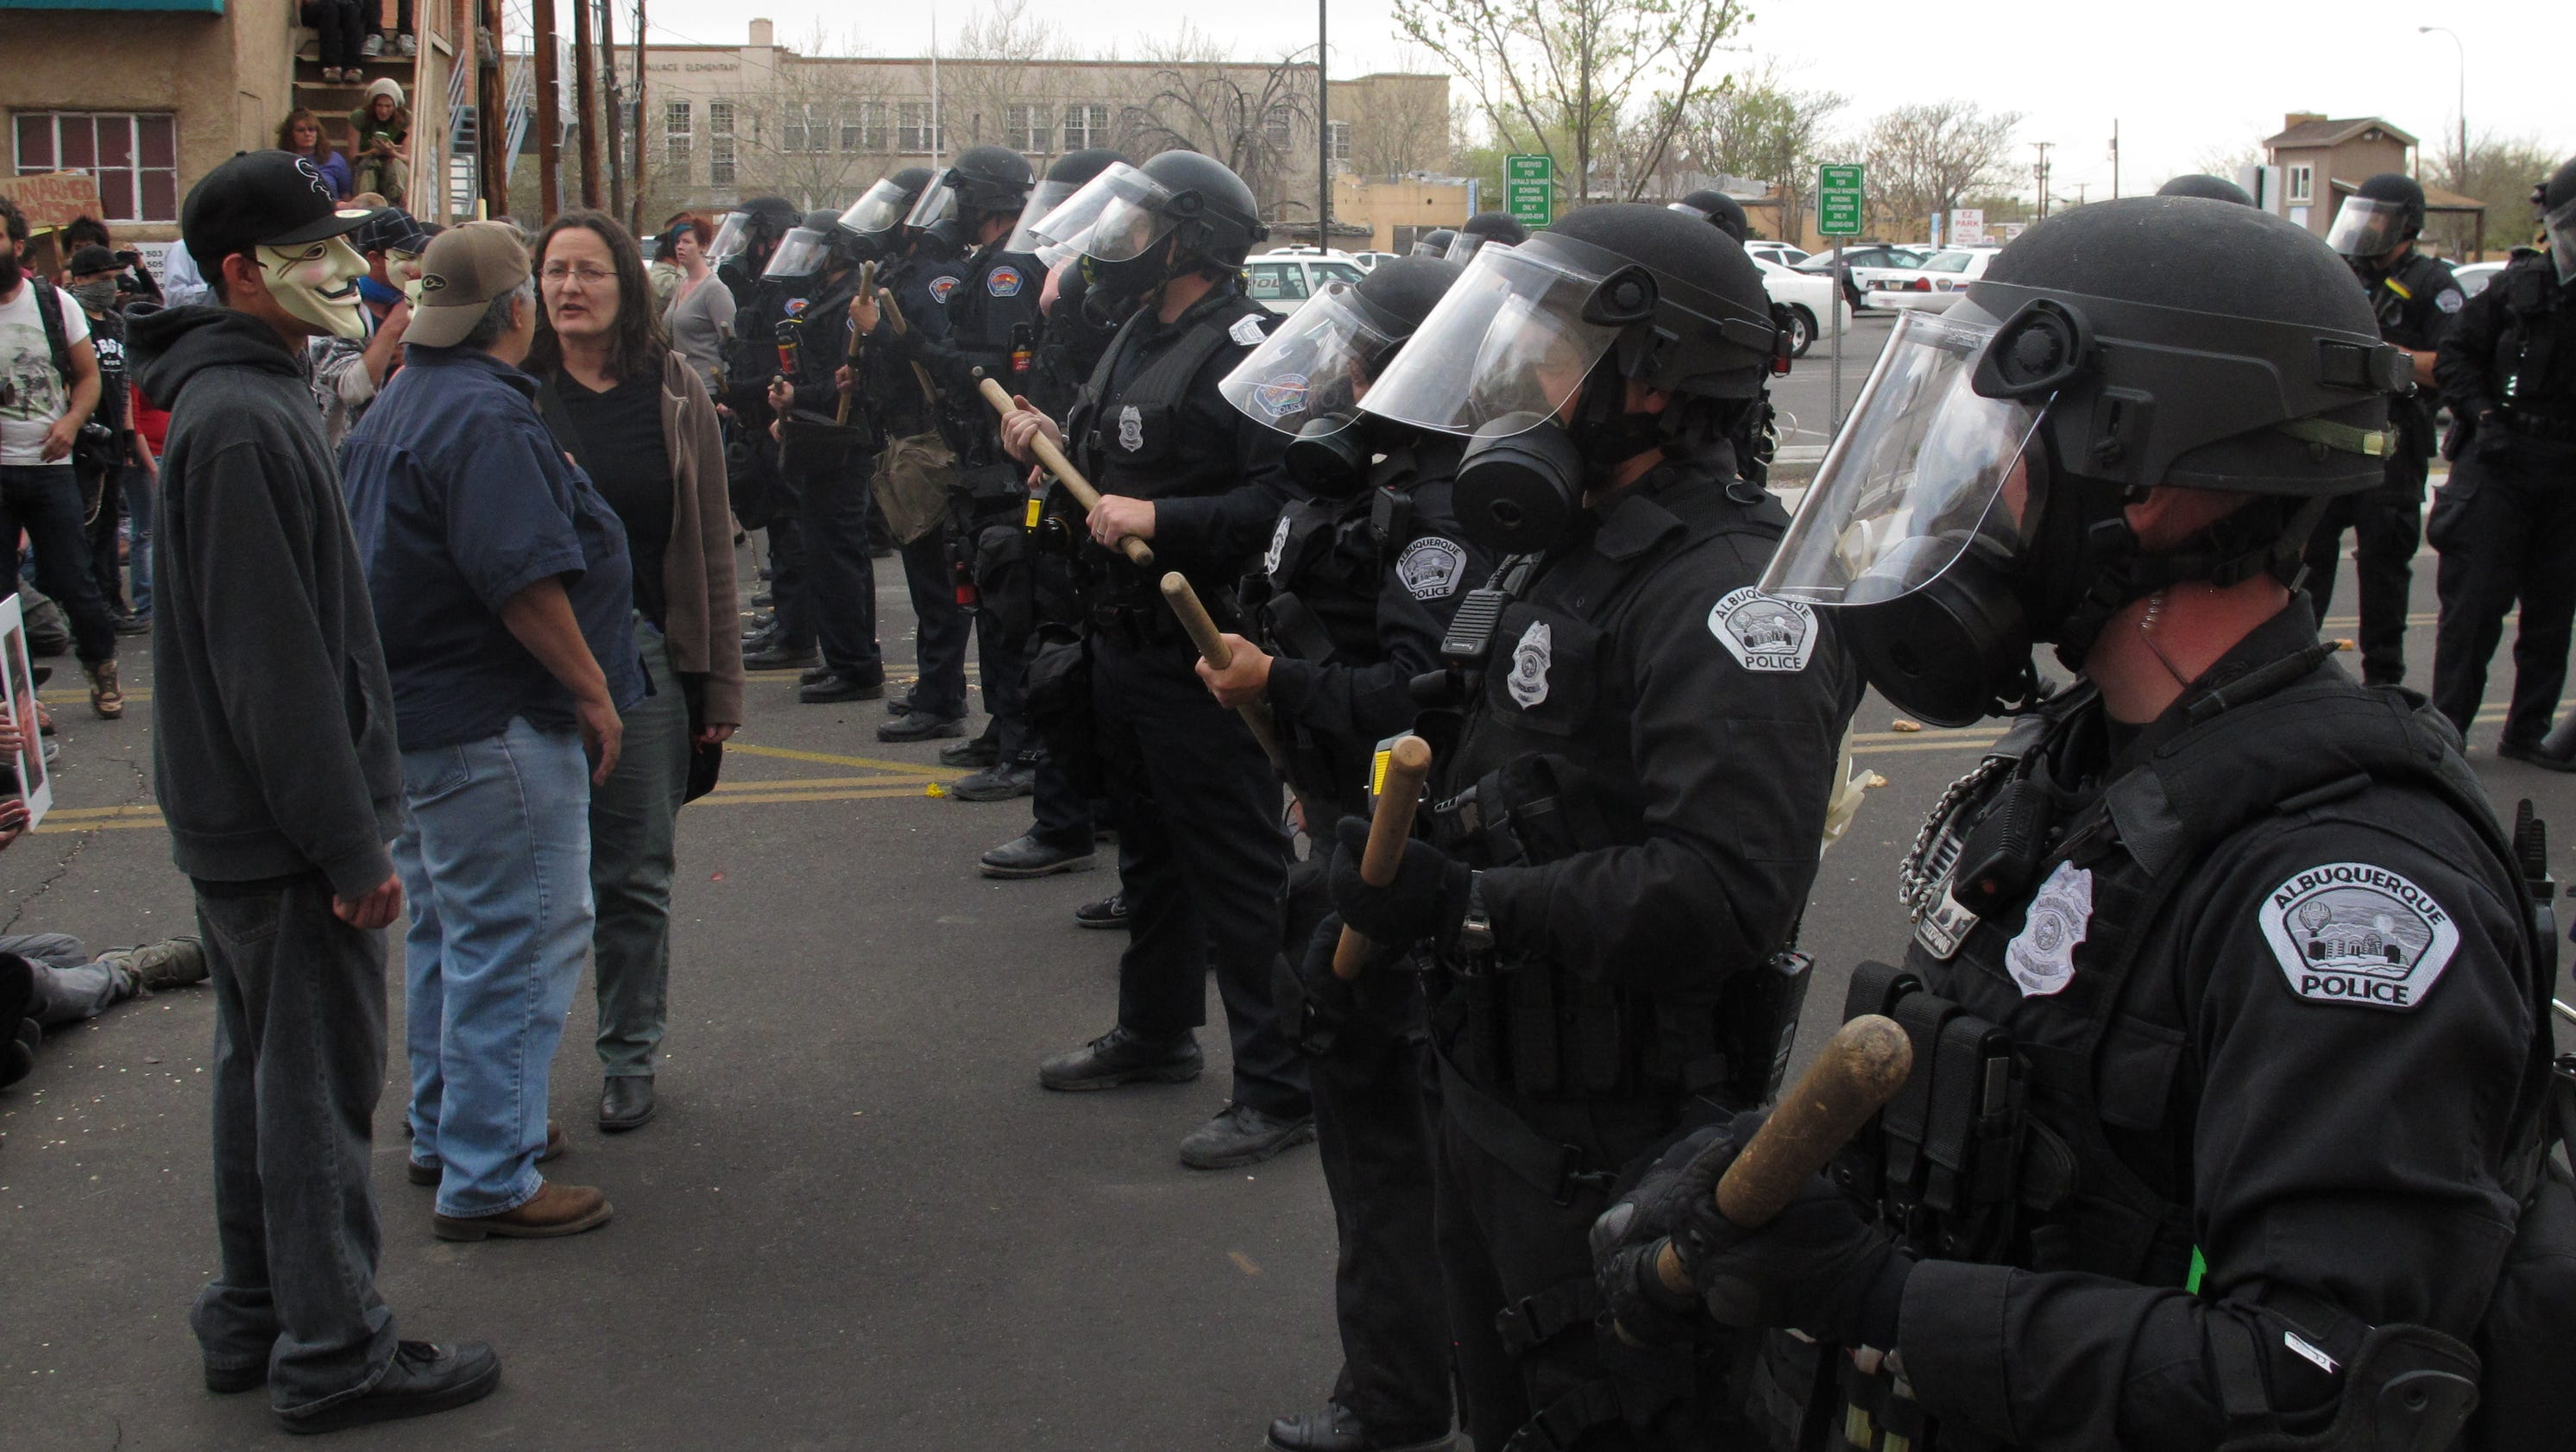 Protest News: Albuquerque Police Face Hundreds Of Protesters